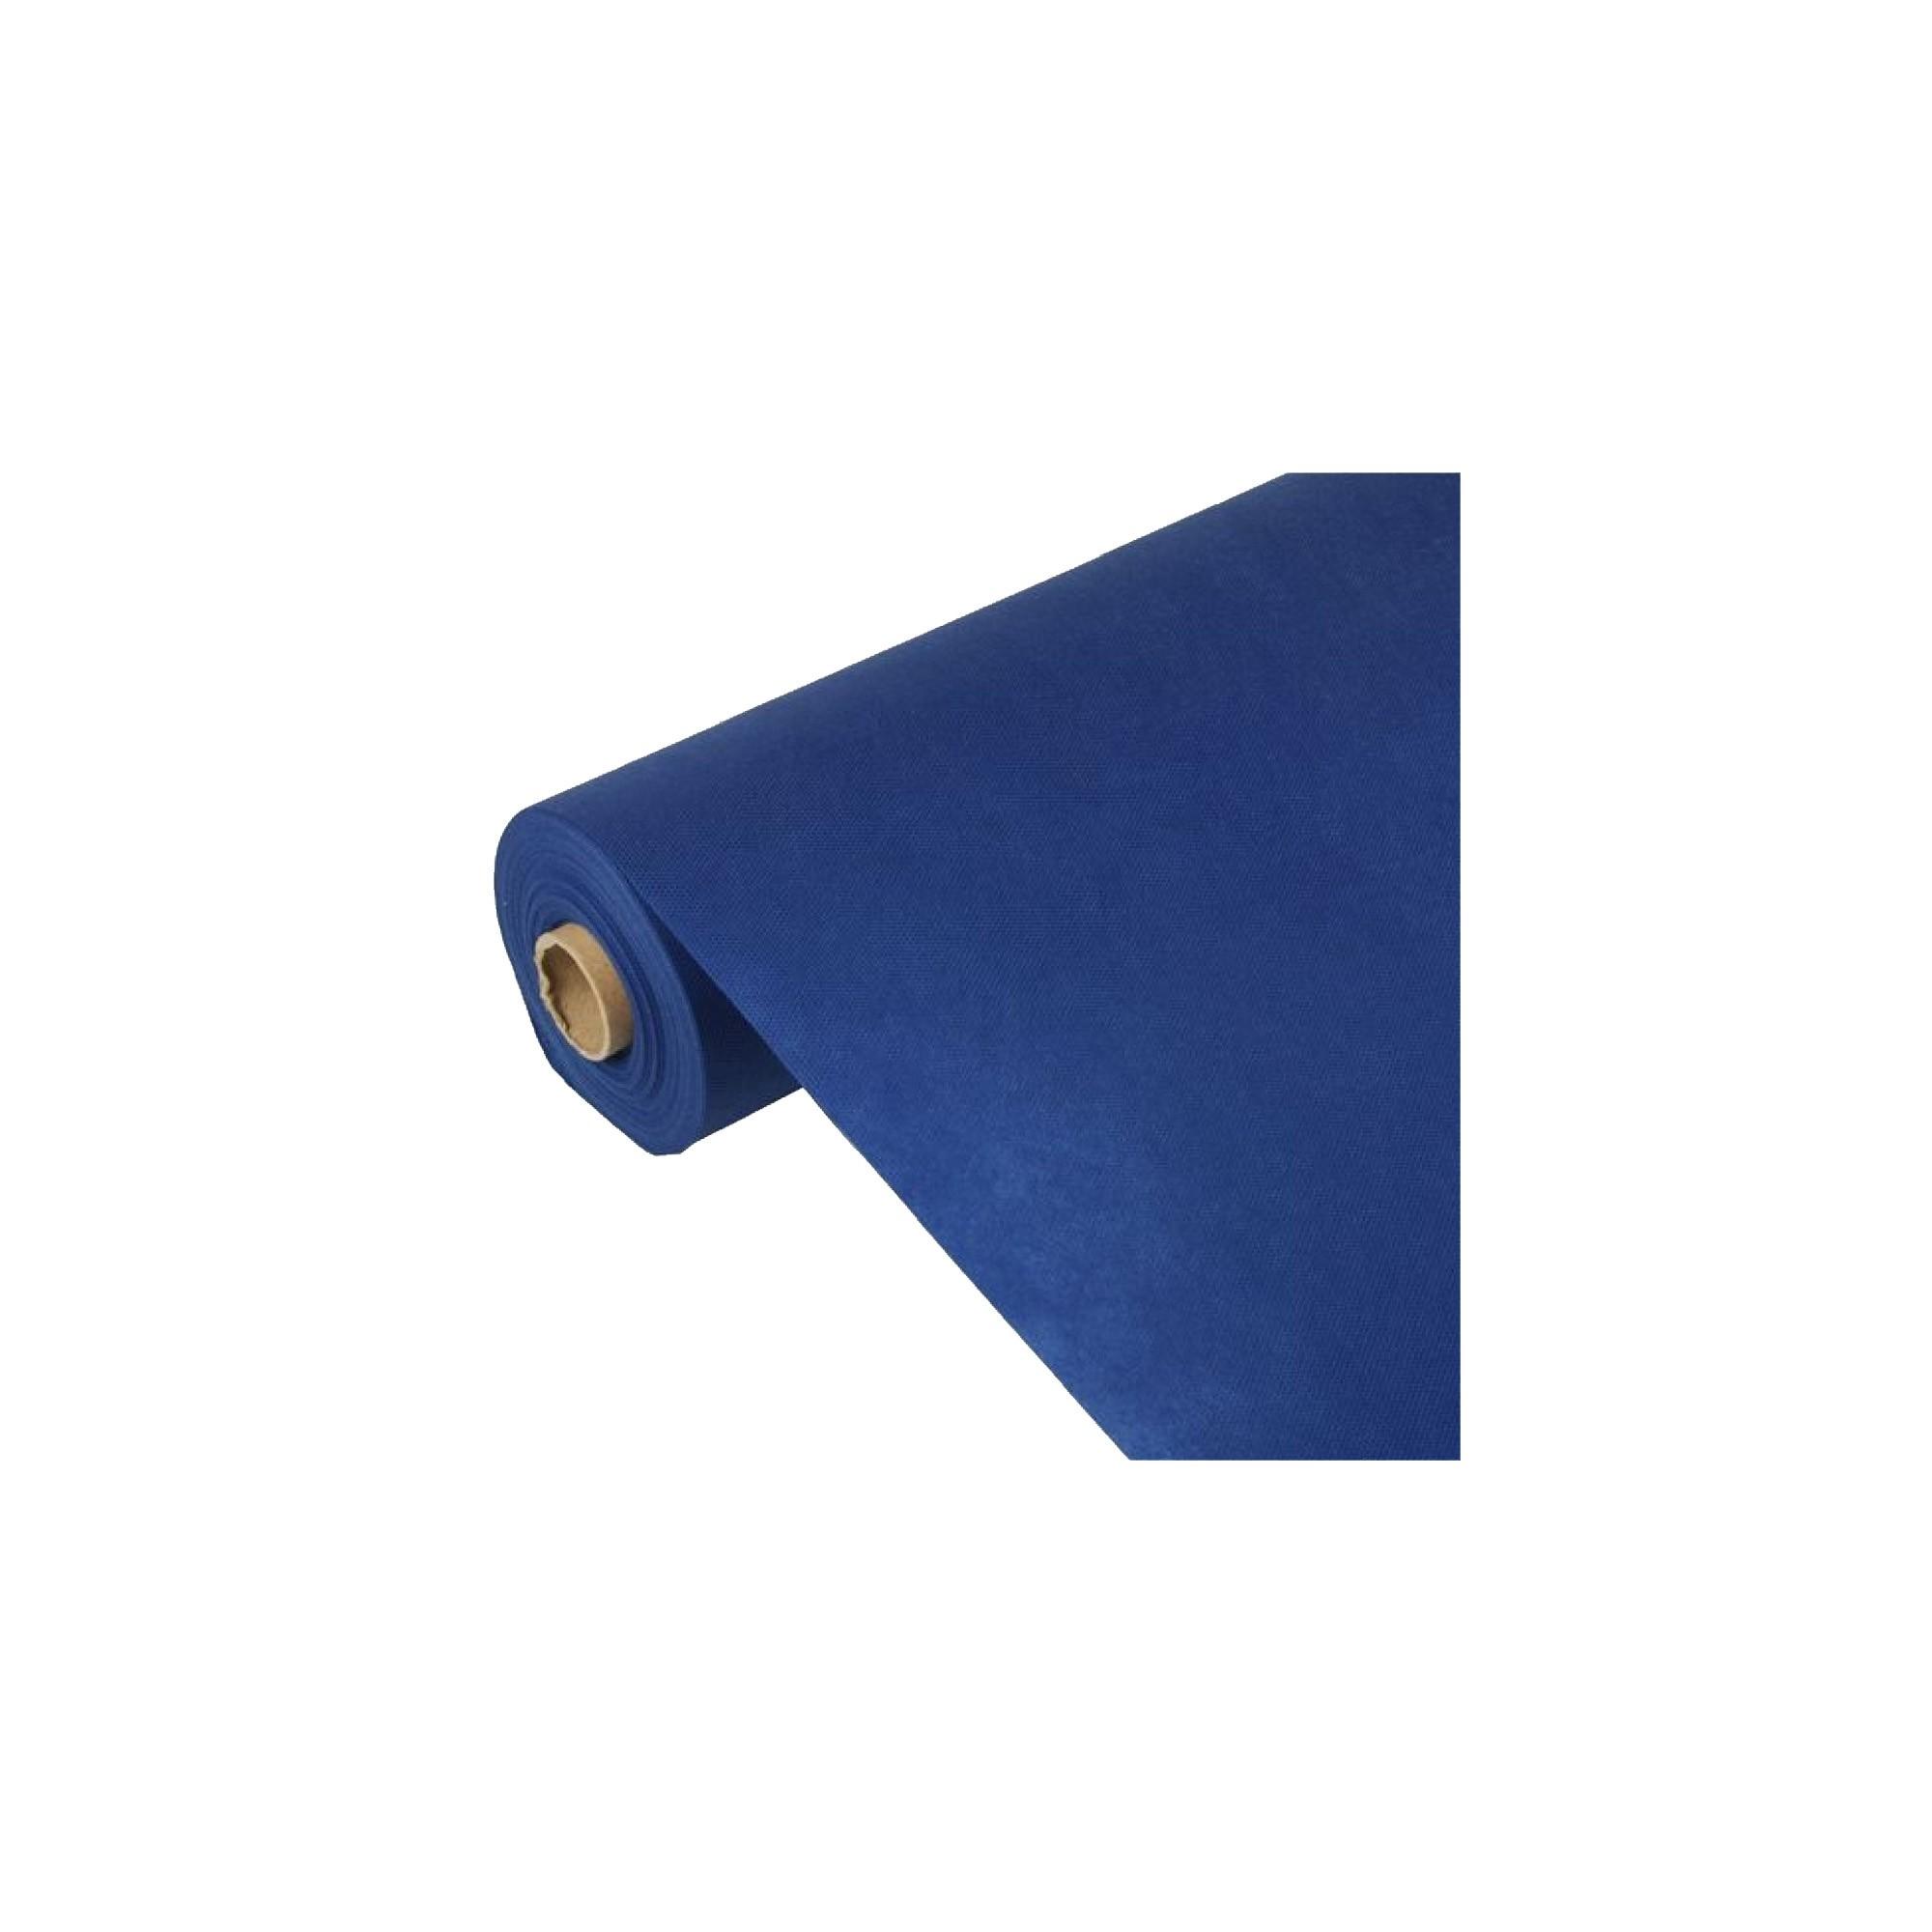 TNT LISO 10M - Azul Royal